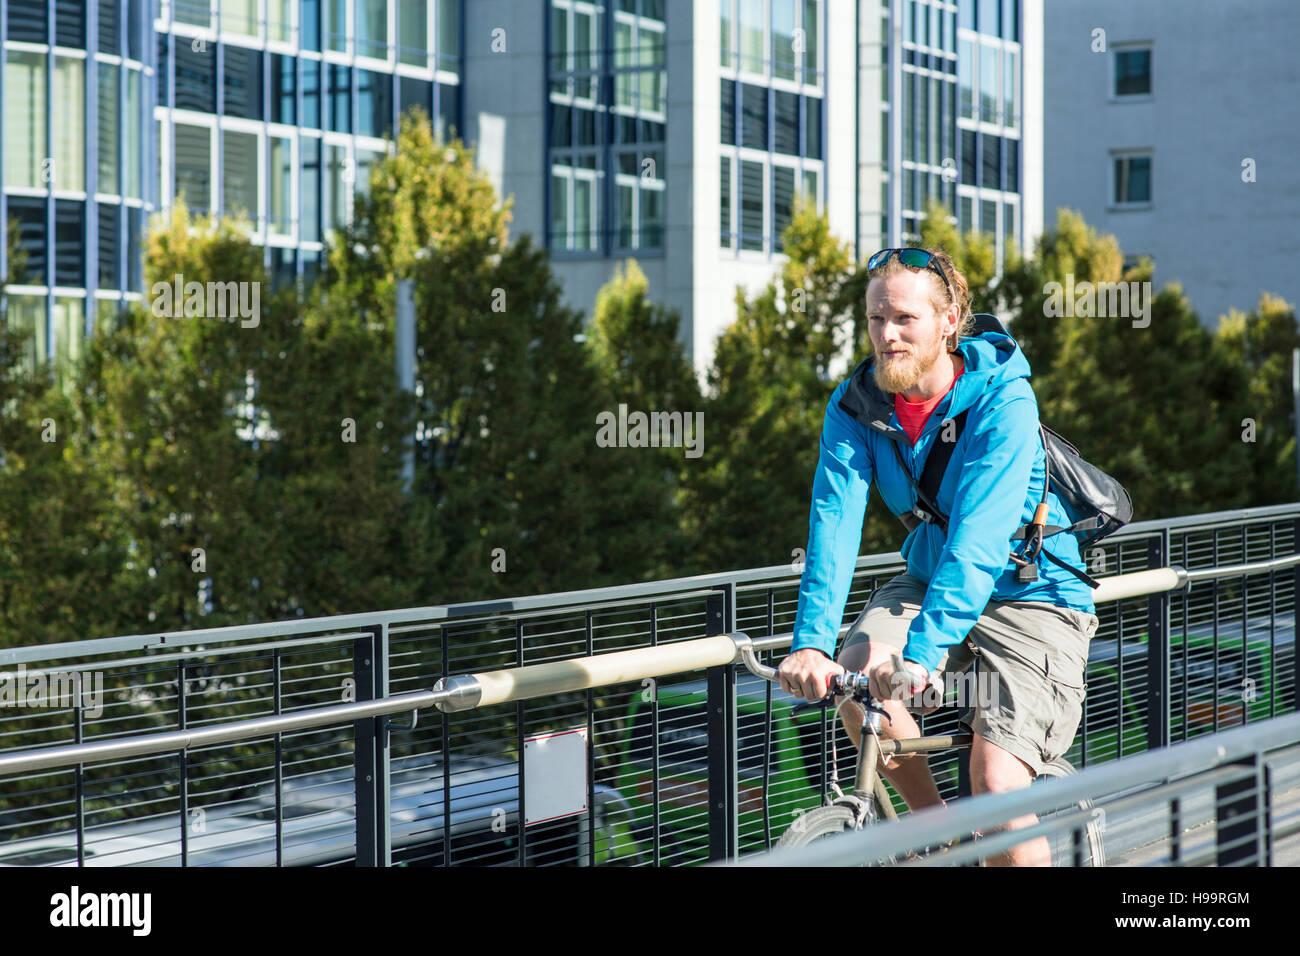 Bike messenger en mouvement Photo Stock